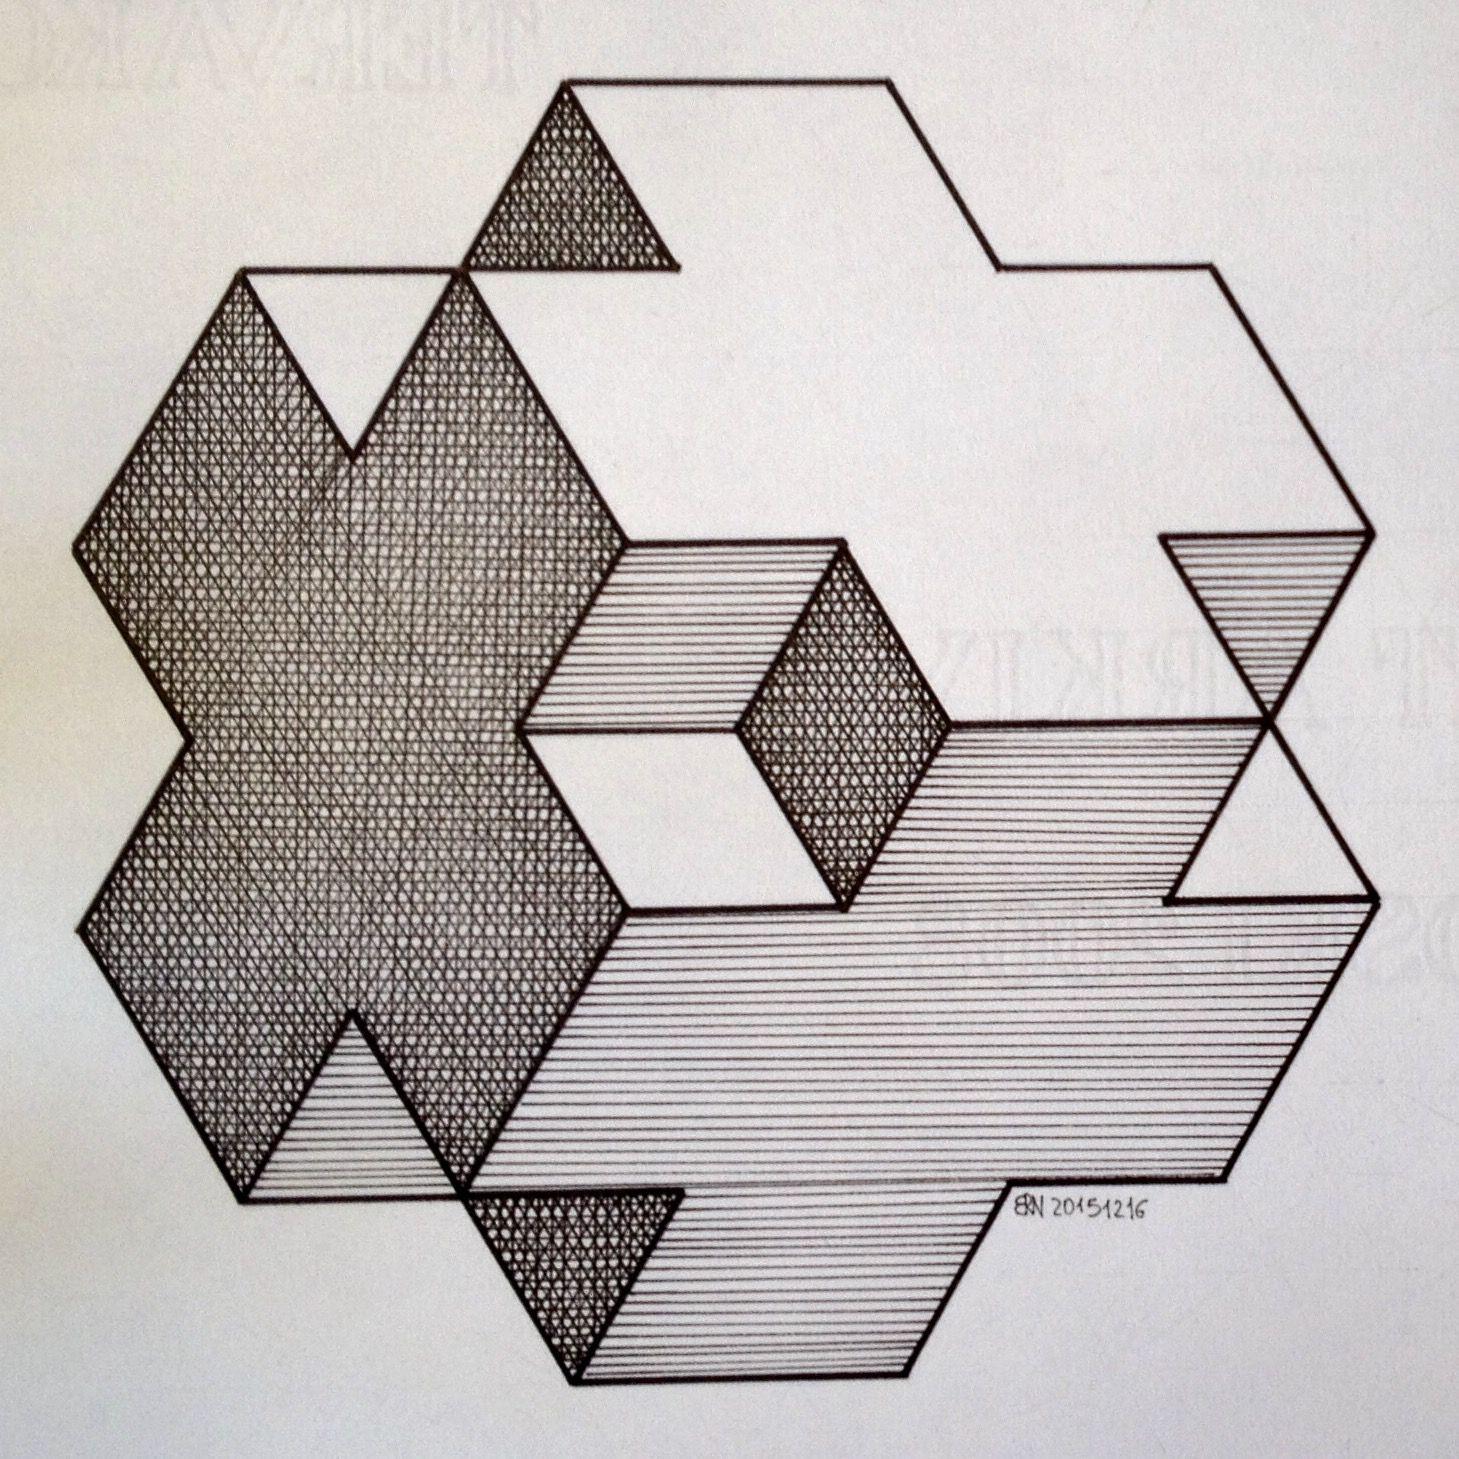 Solid Polyhedra Geometry Symmetry Pattern Pencil